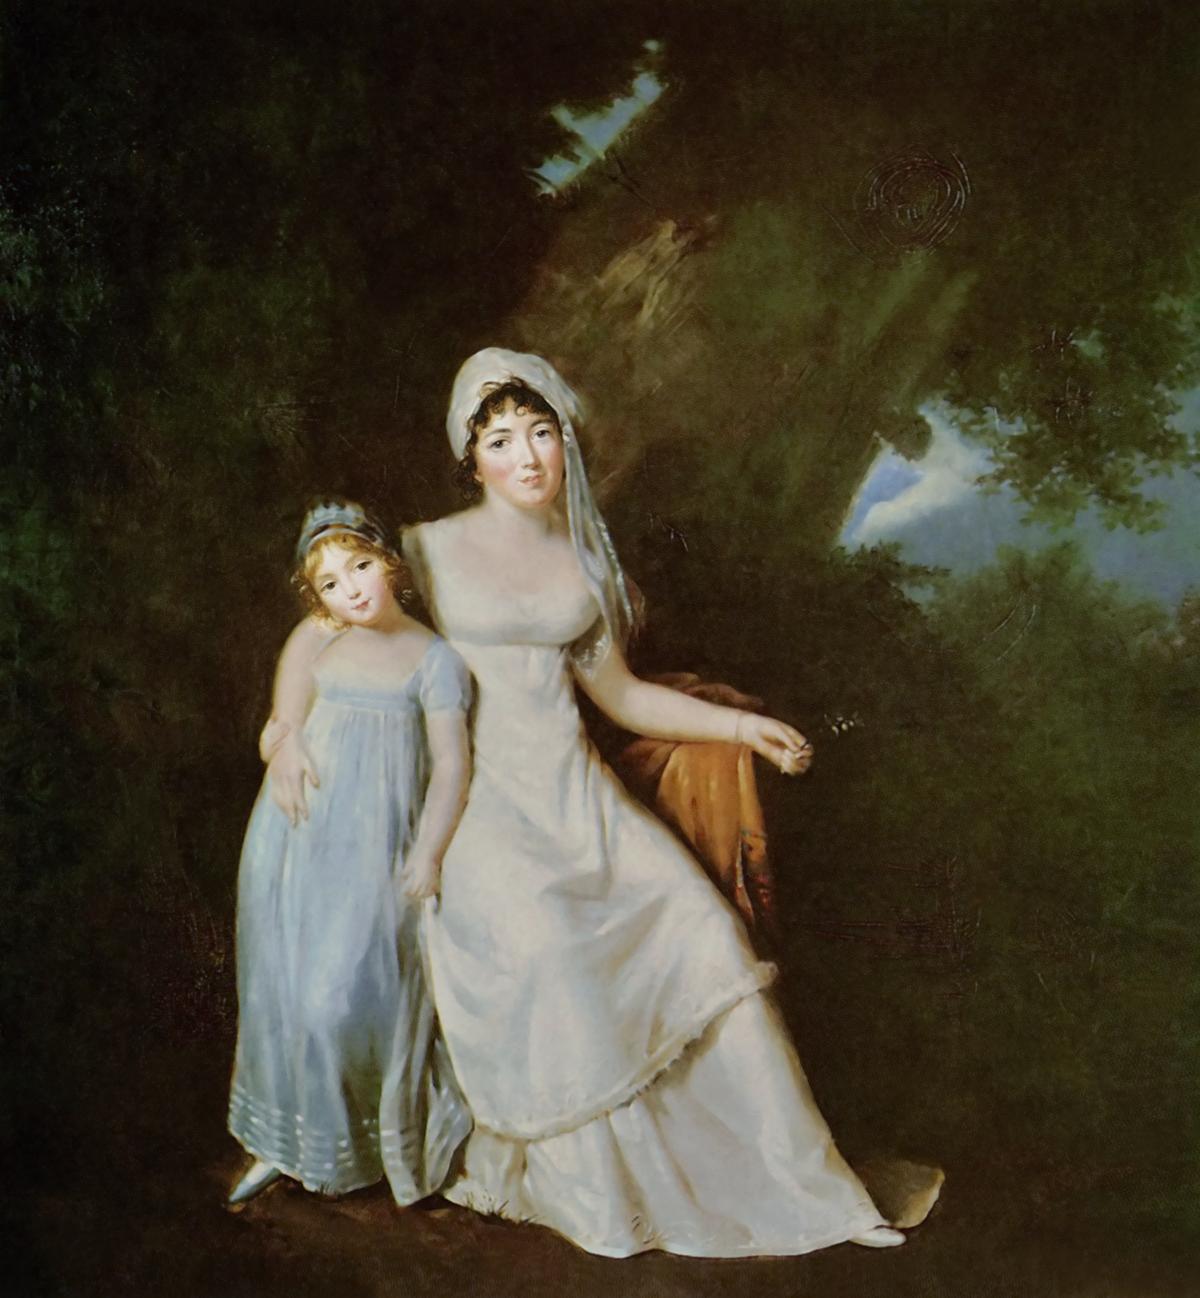 Fichier:Mme de Staël avec sa fille Albertine.png — Wikipédia